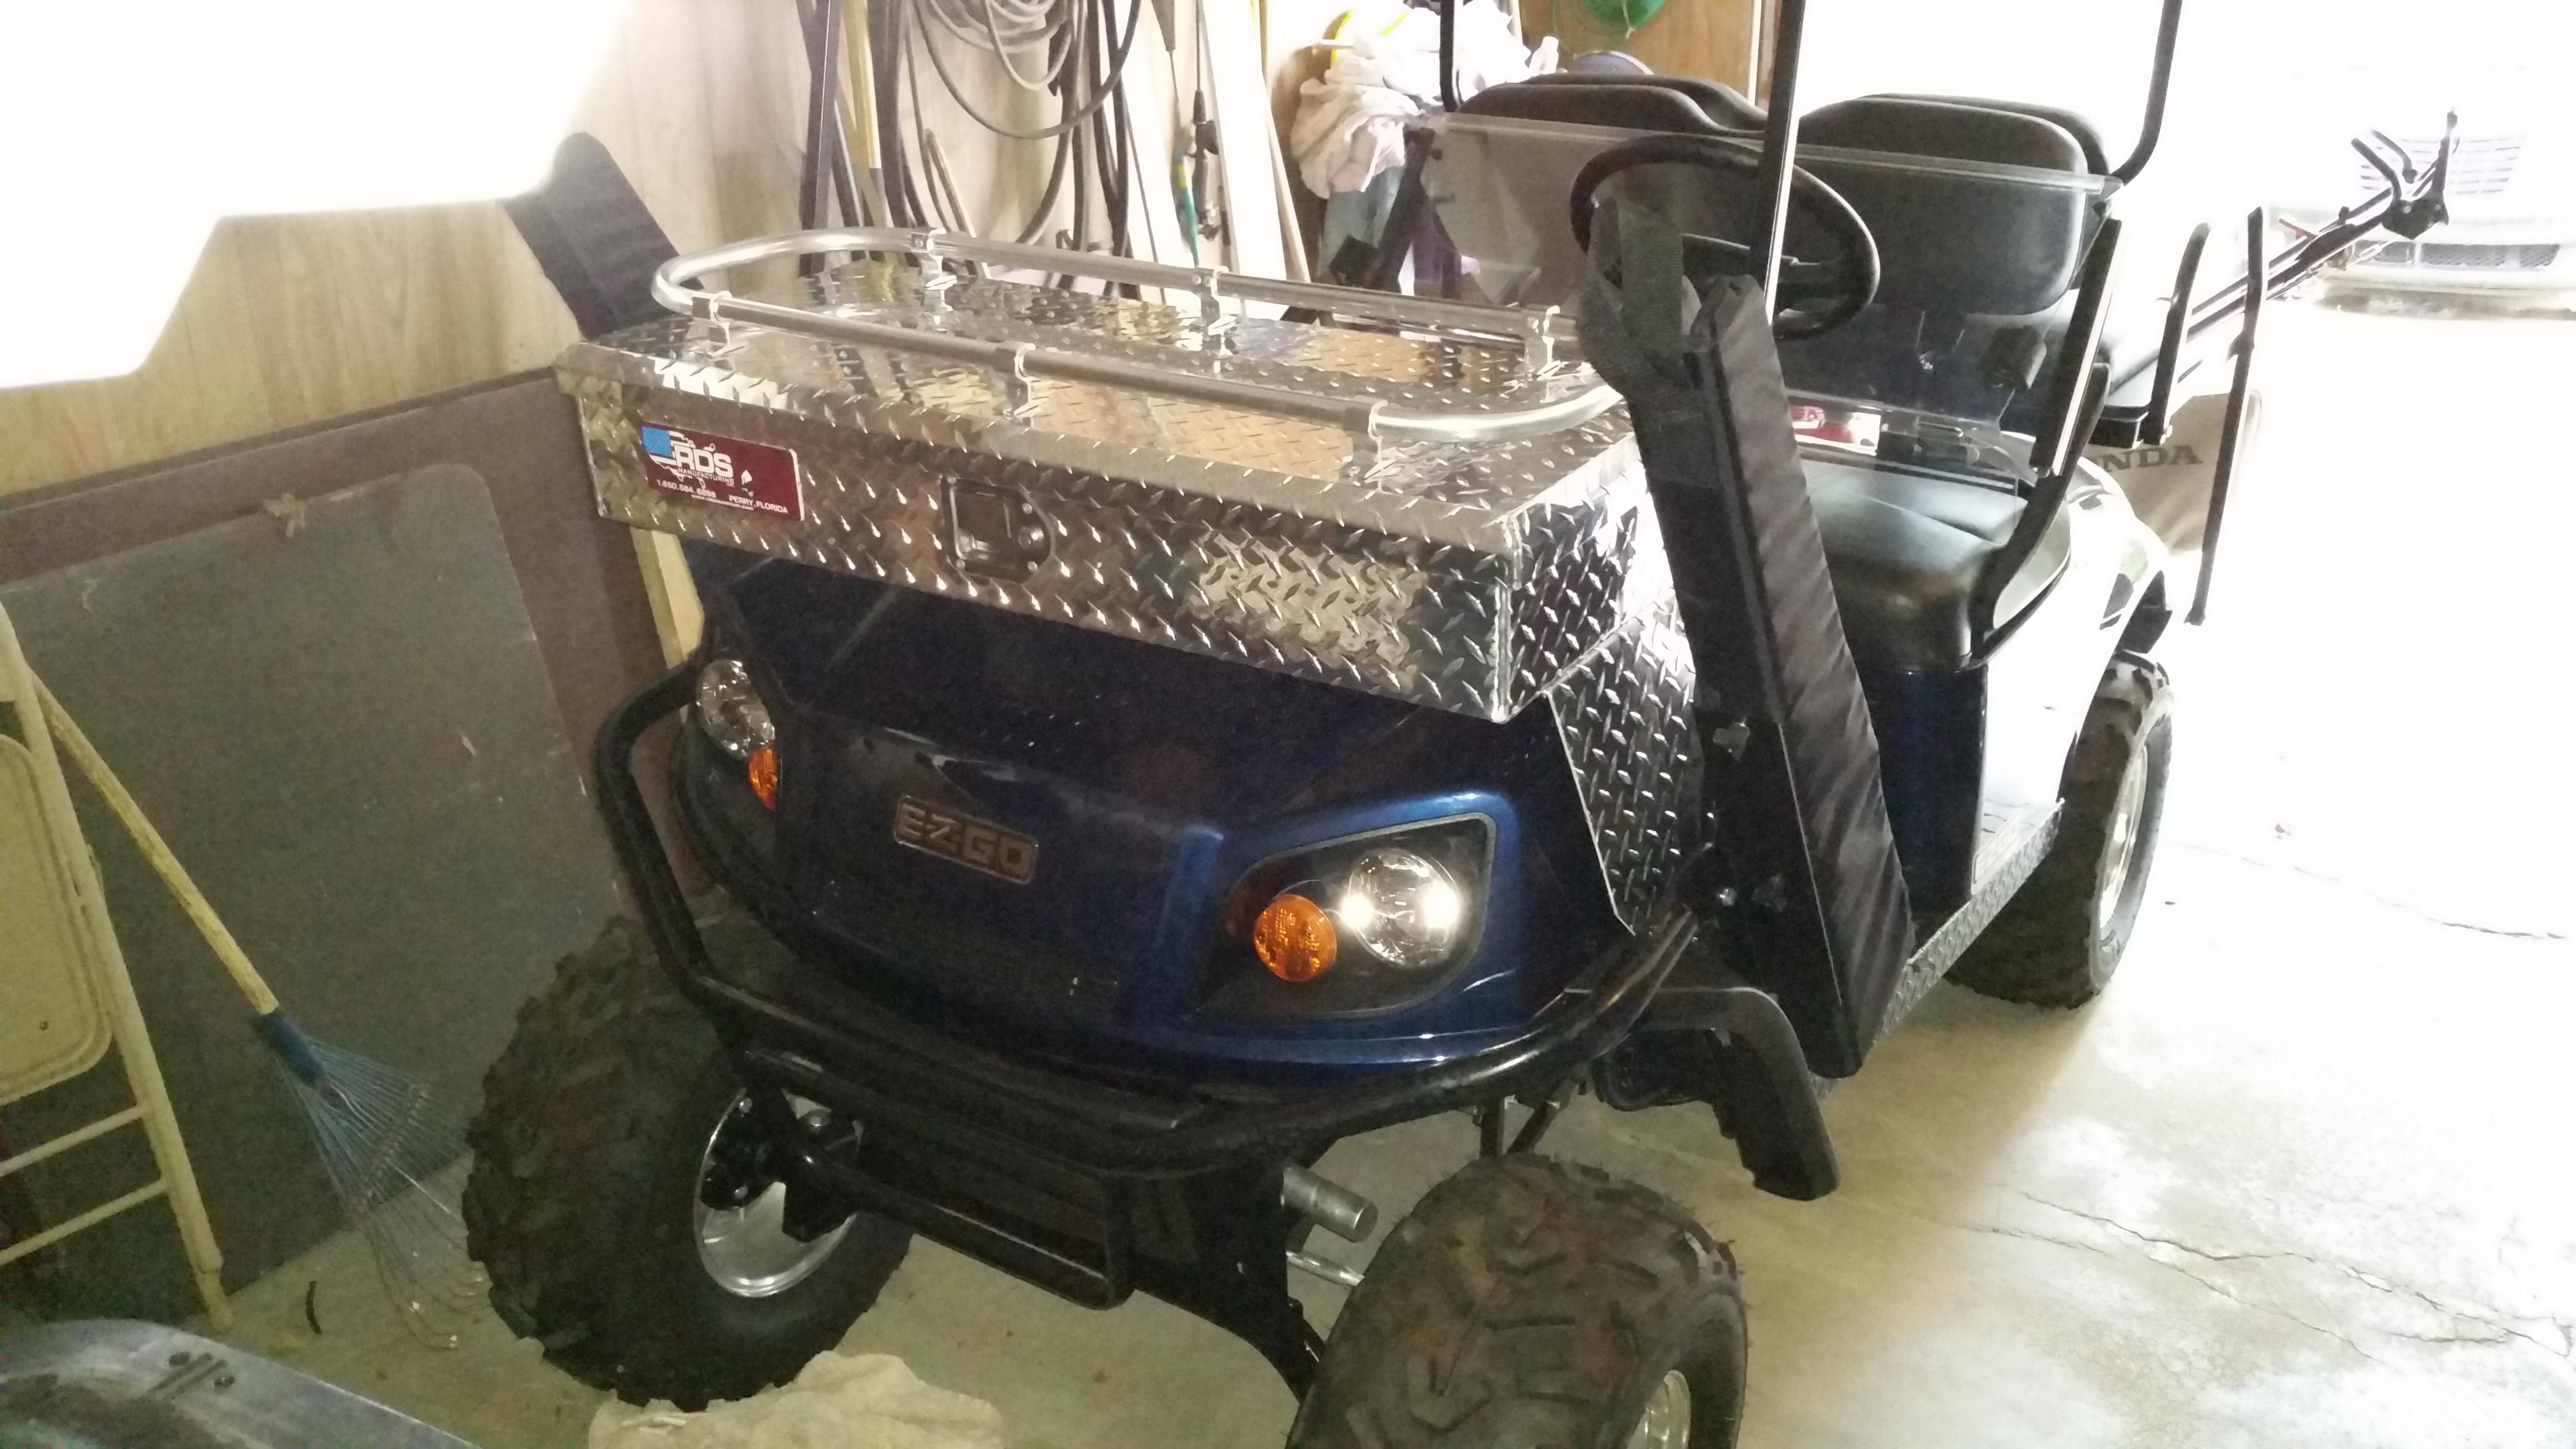 Best gun mount for a golf cart.   Trap Shooters Forum Ezgo Golf Cart Gun Rack on utv gun racks, ezgo kawasaki engine parts, golf cart storage racks, ezgo roof dimensions, ezgo racks gun diy, ezgo st 480 workhorse, golf cart front racks, atv gun racks,